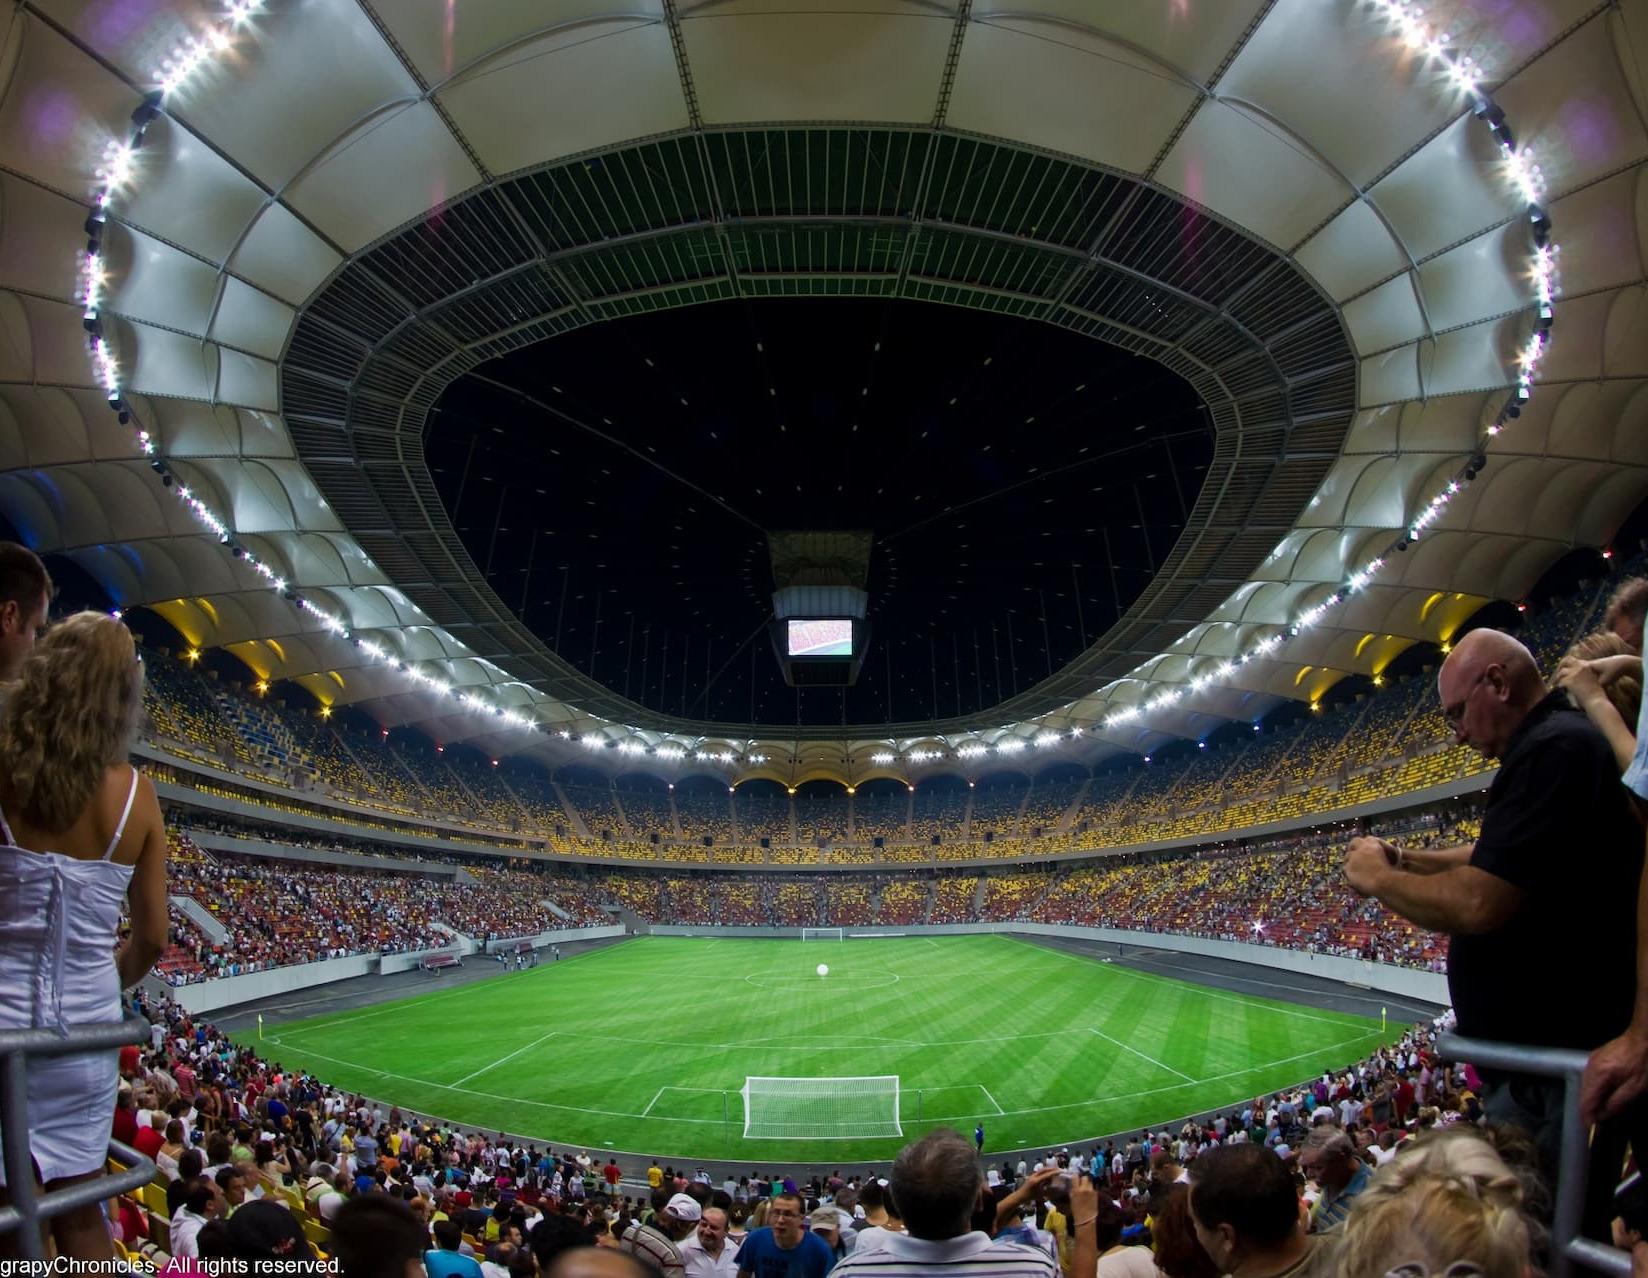 Arena Națională (National Arena Bucharest)